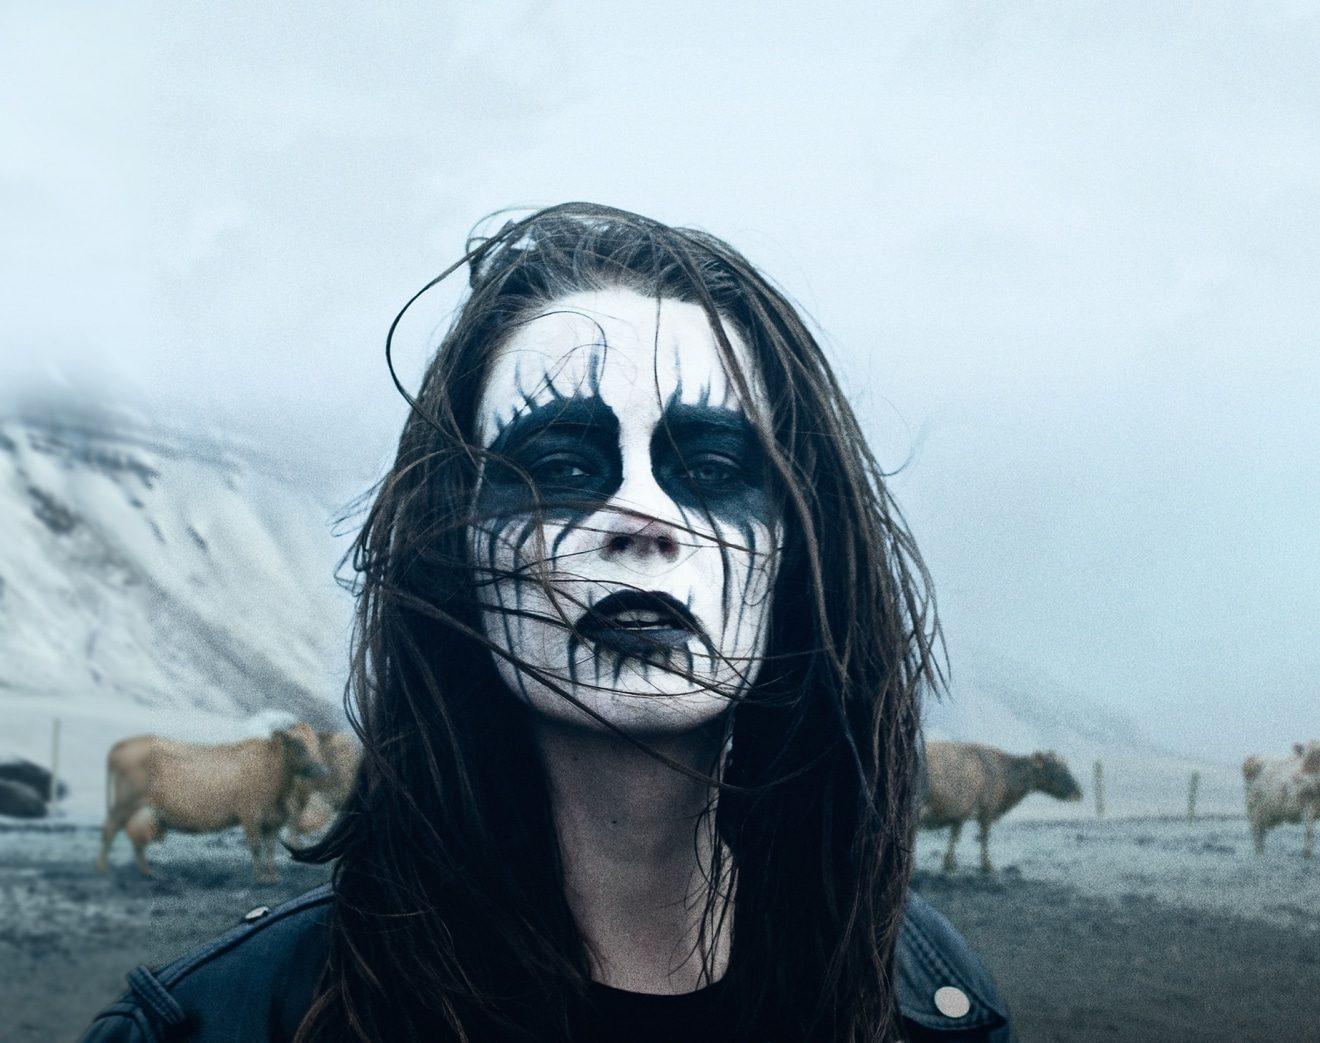 Ragnar Bragason's 'Metalhead' film on demand